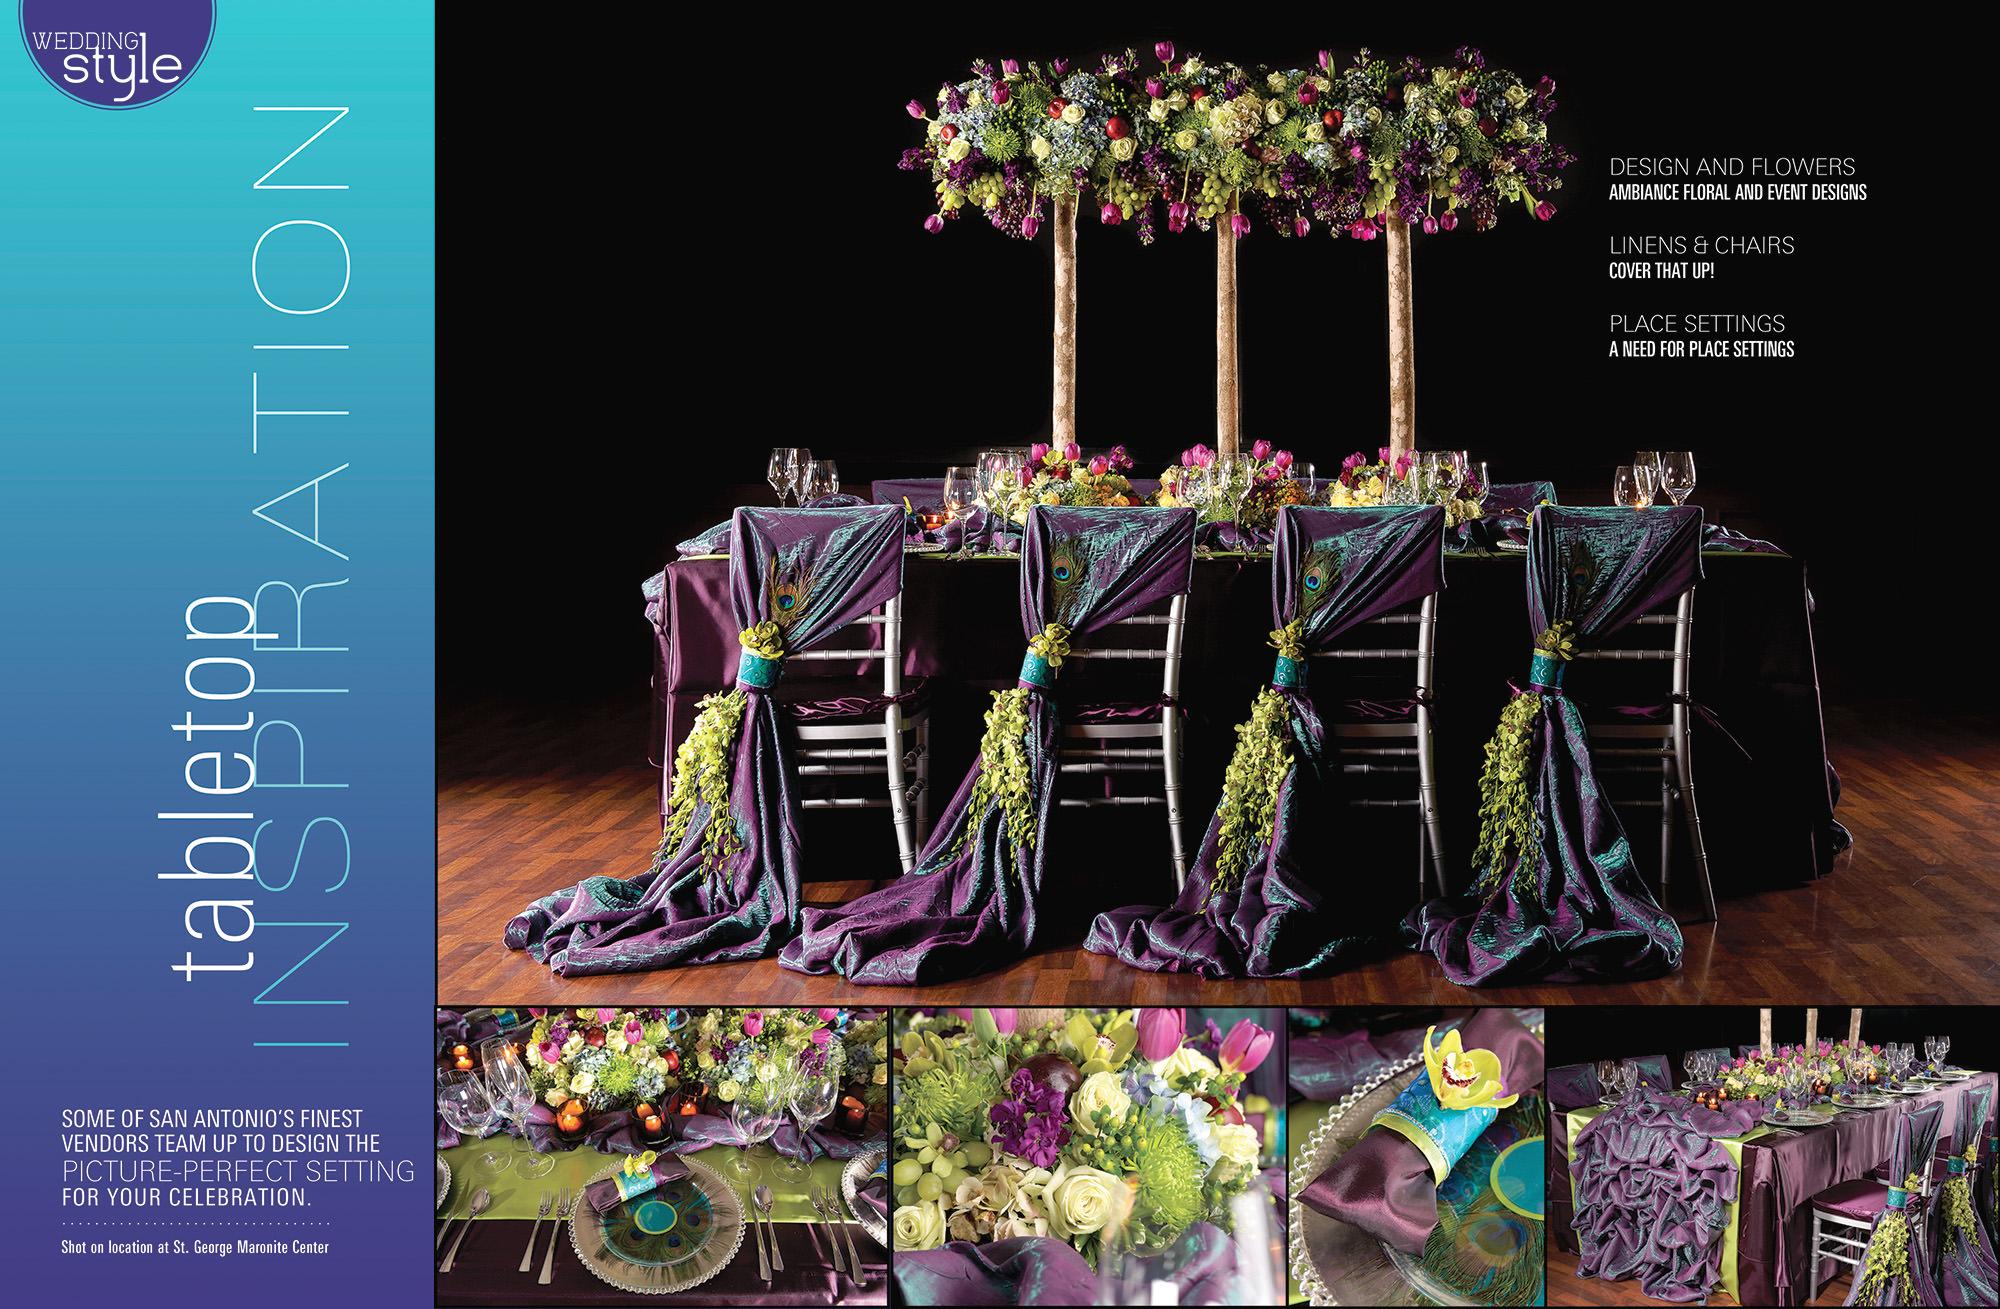 San Antonio Weddings Magazine Feature  (2011, Tabletop Inspiration)